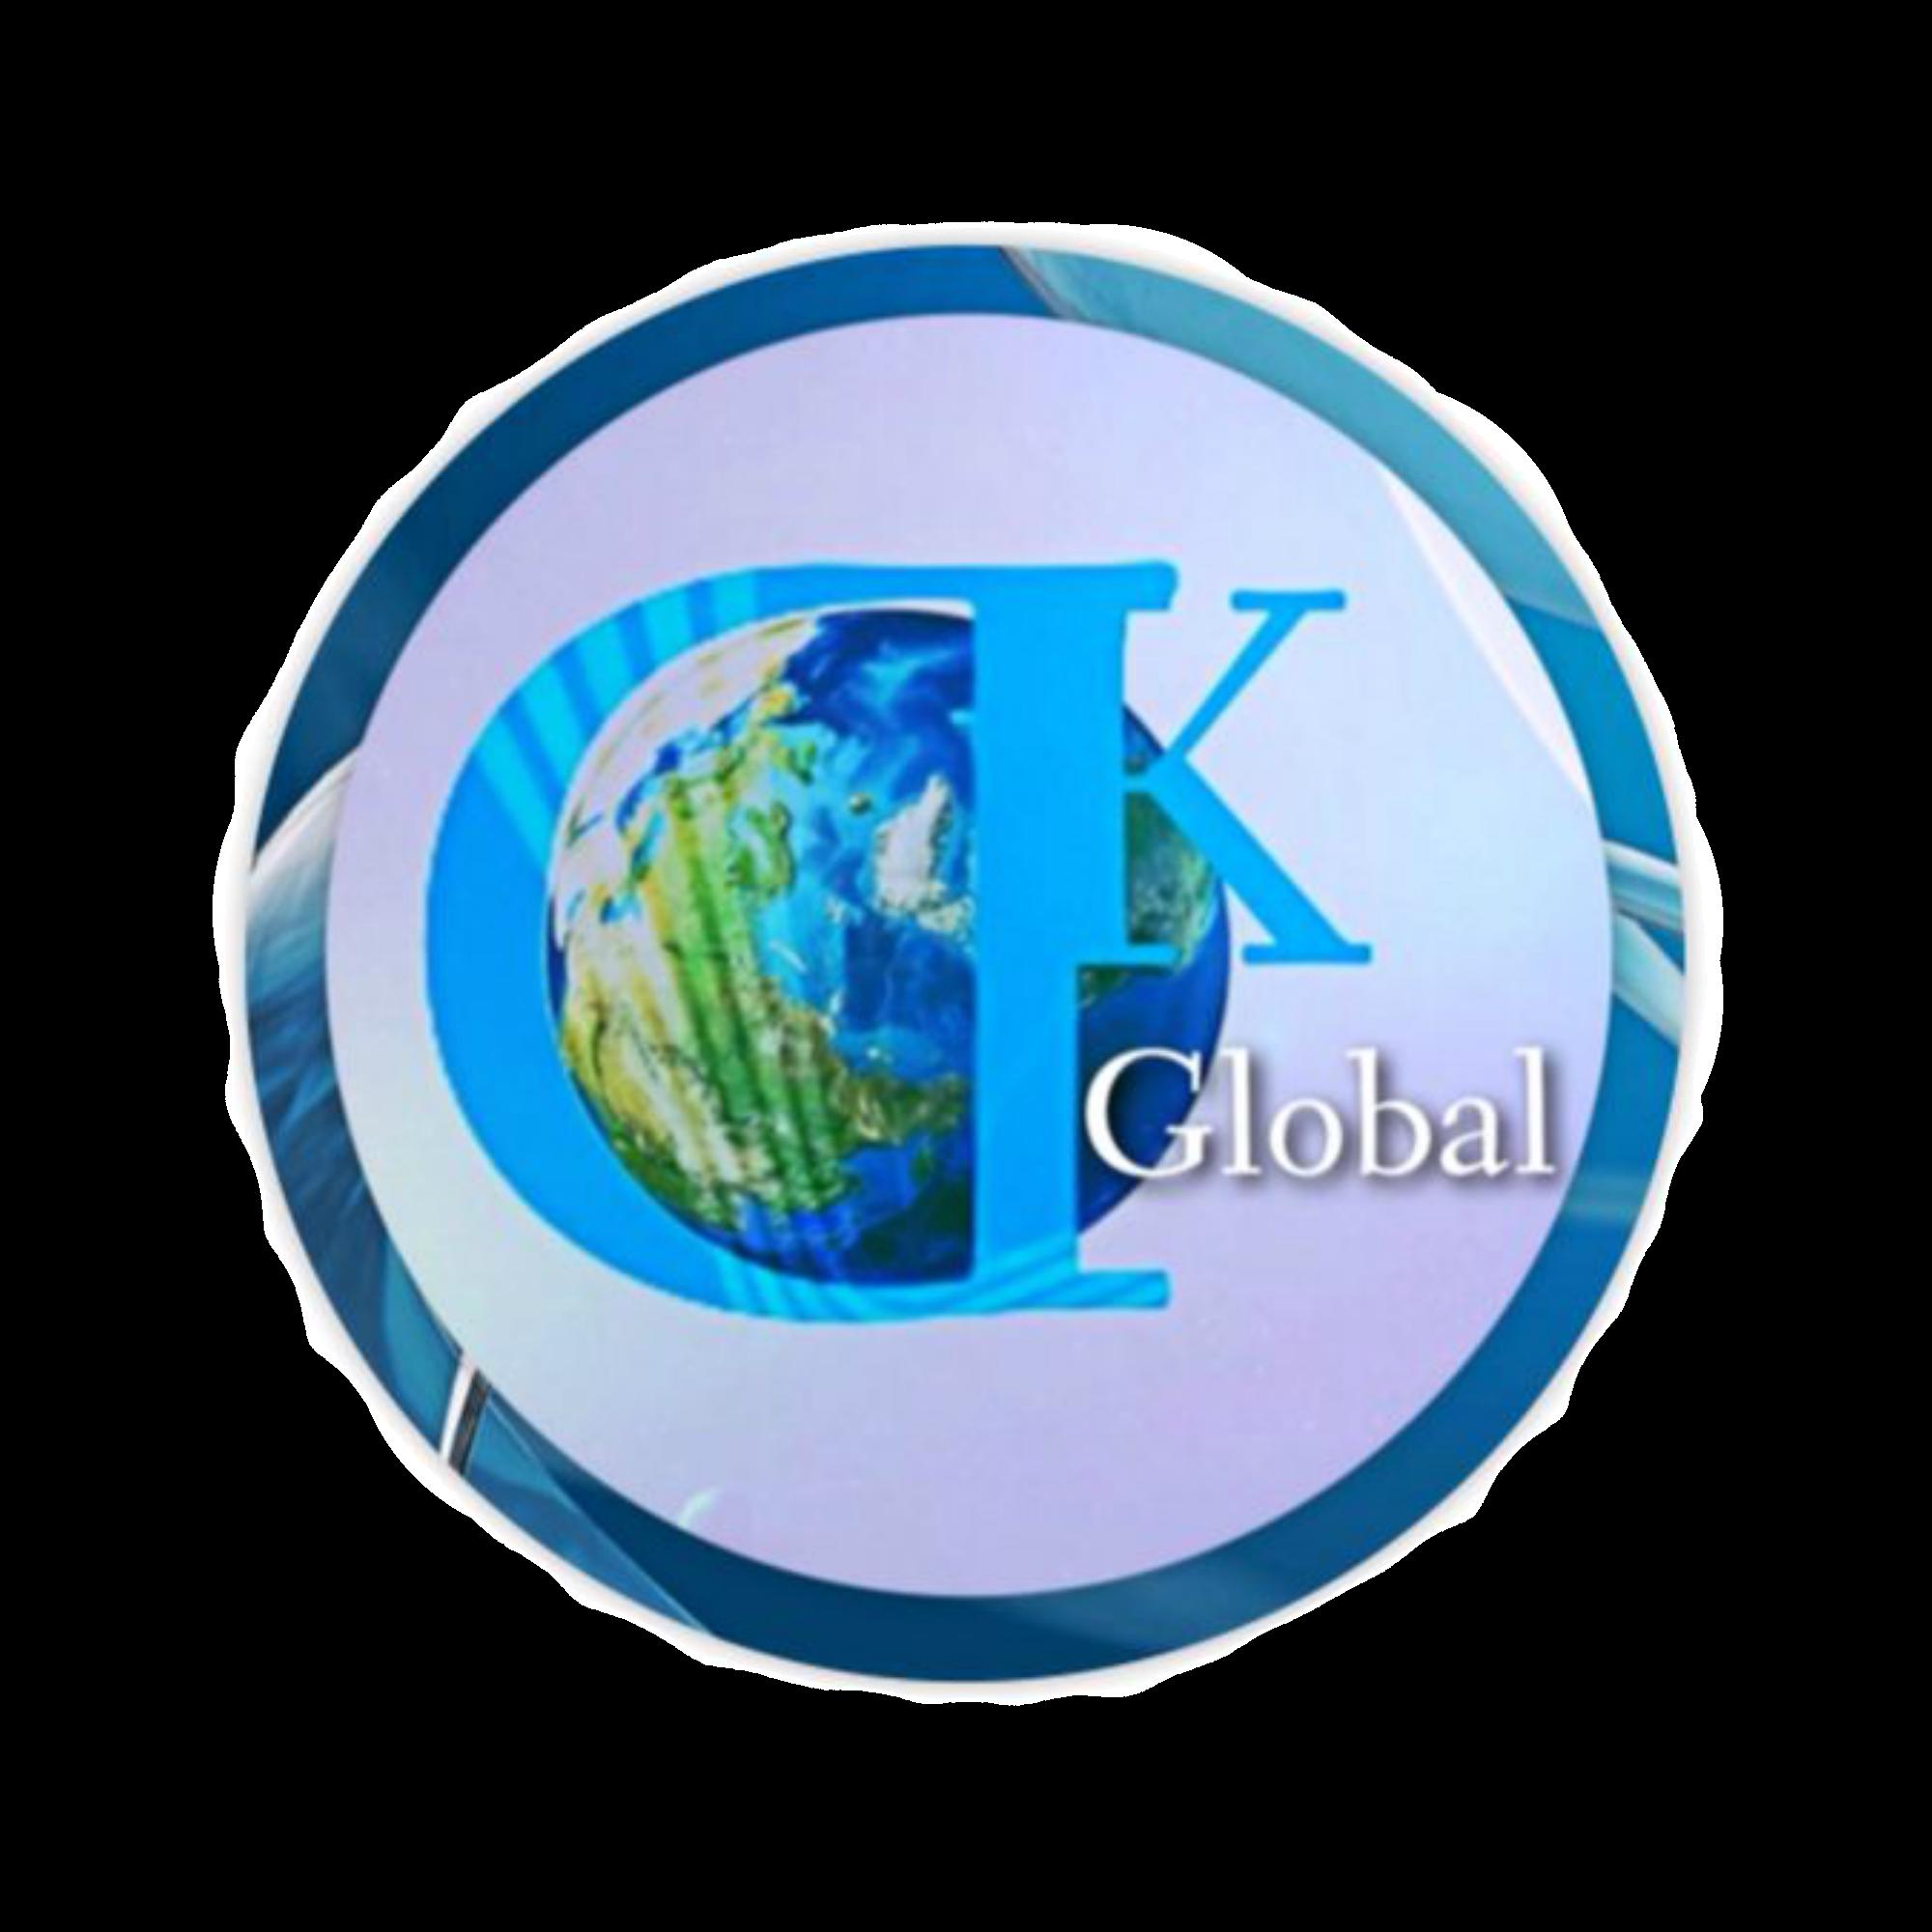 dk global